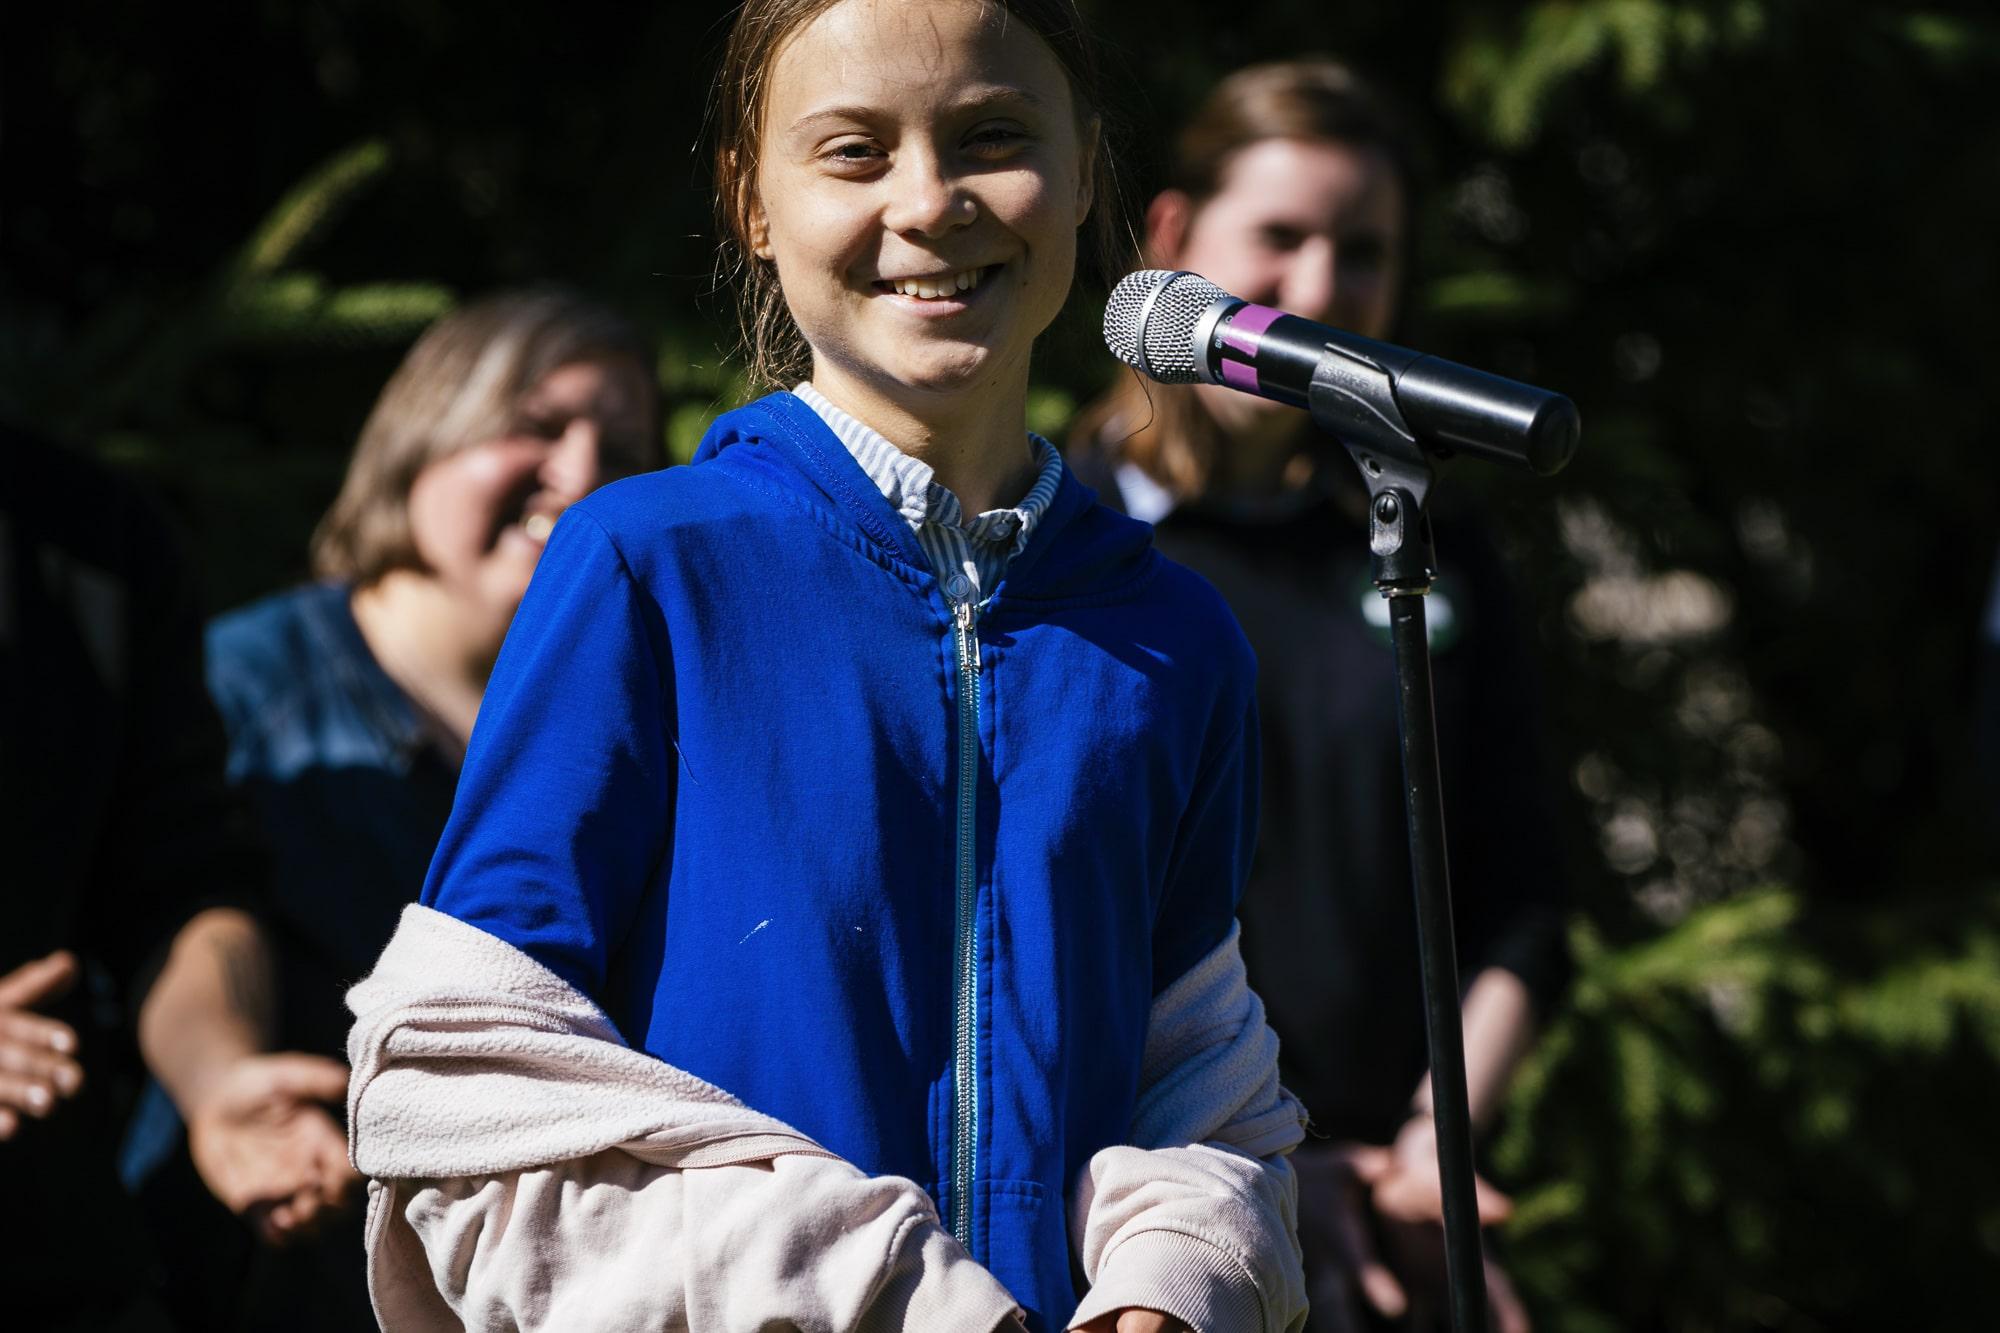 Demonstration on September 27 for action on climat change